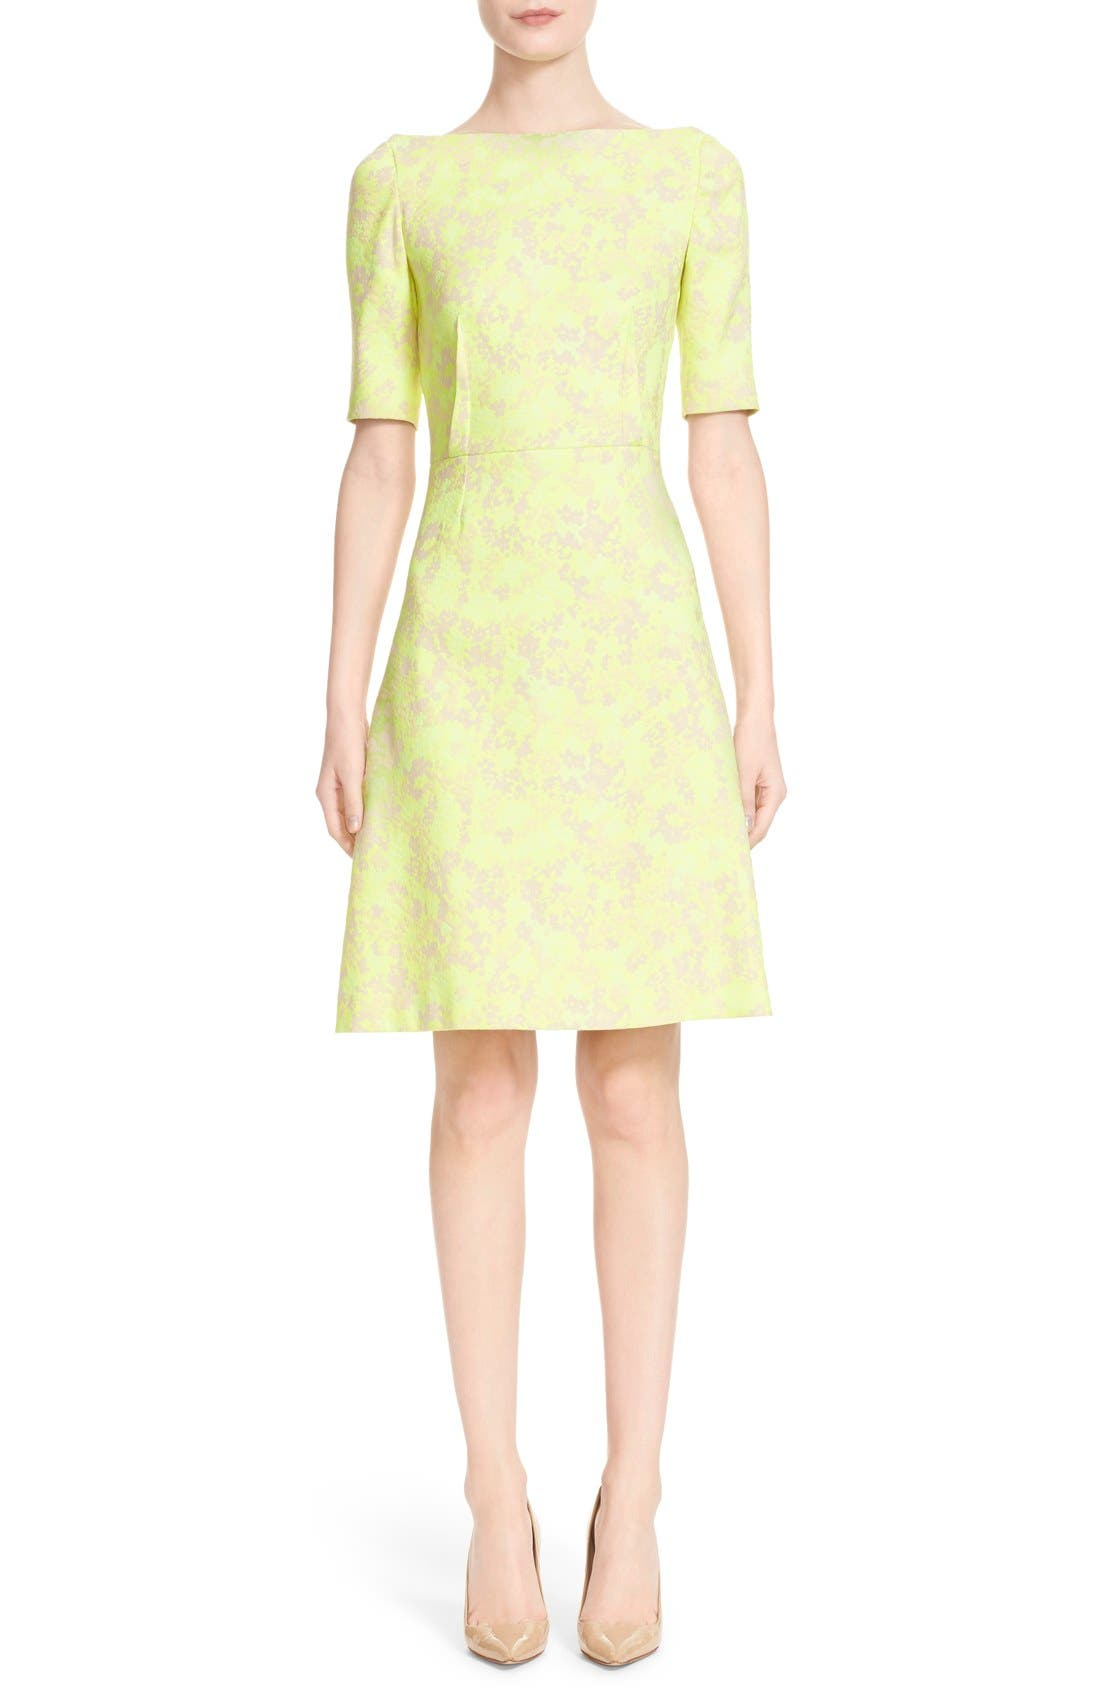 Alternate Image 1 Selected - Lela Rose Floral Jacquard Sheath Dress